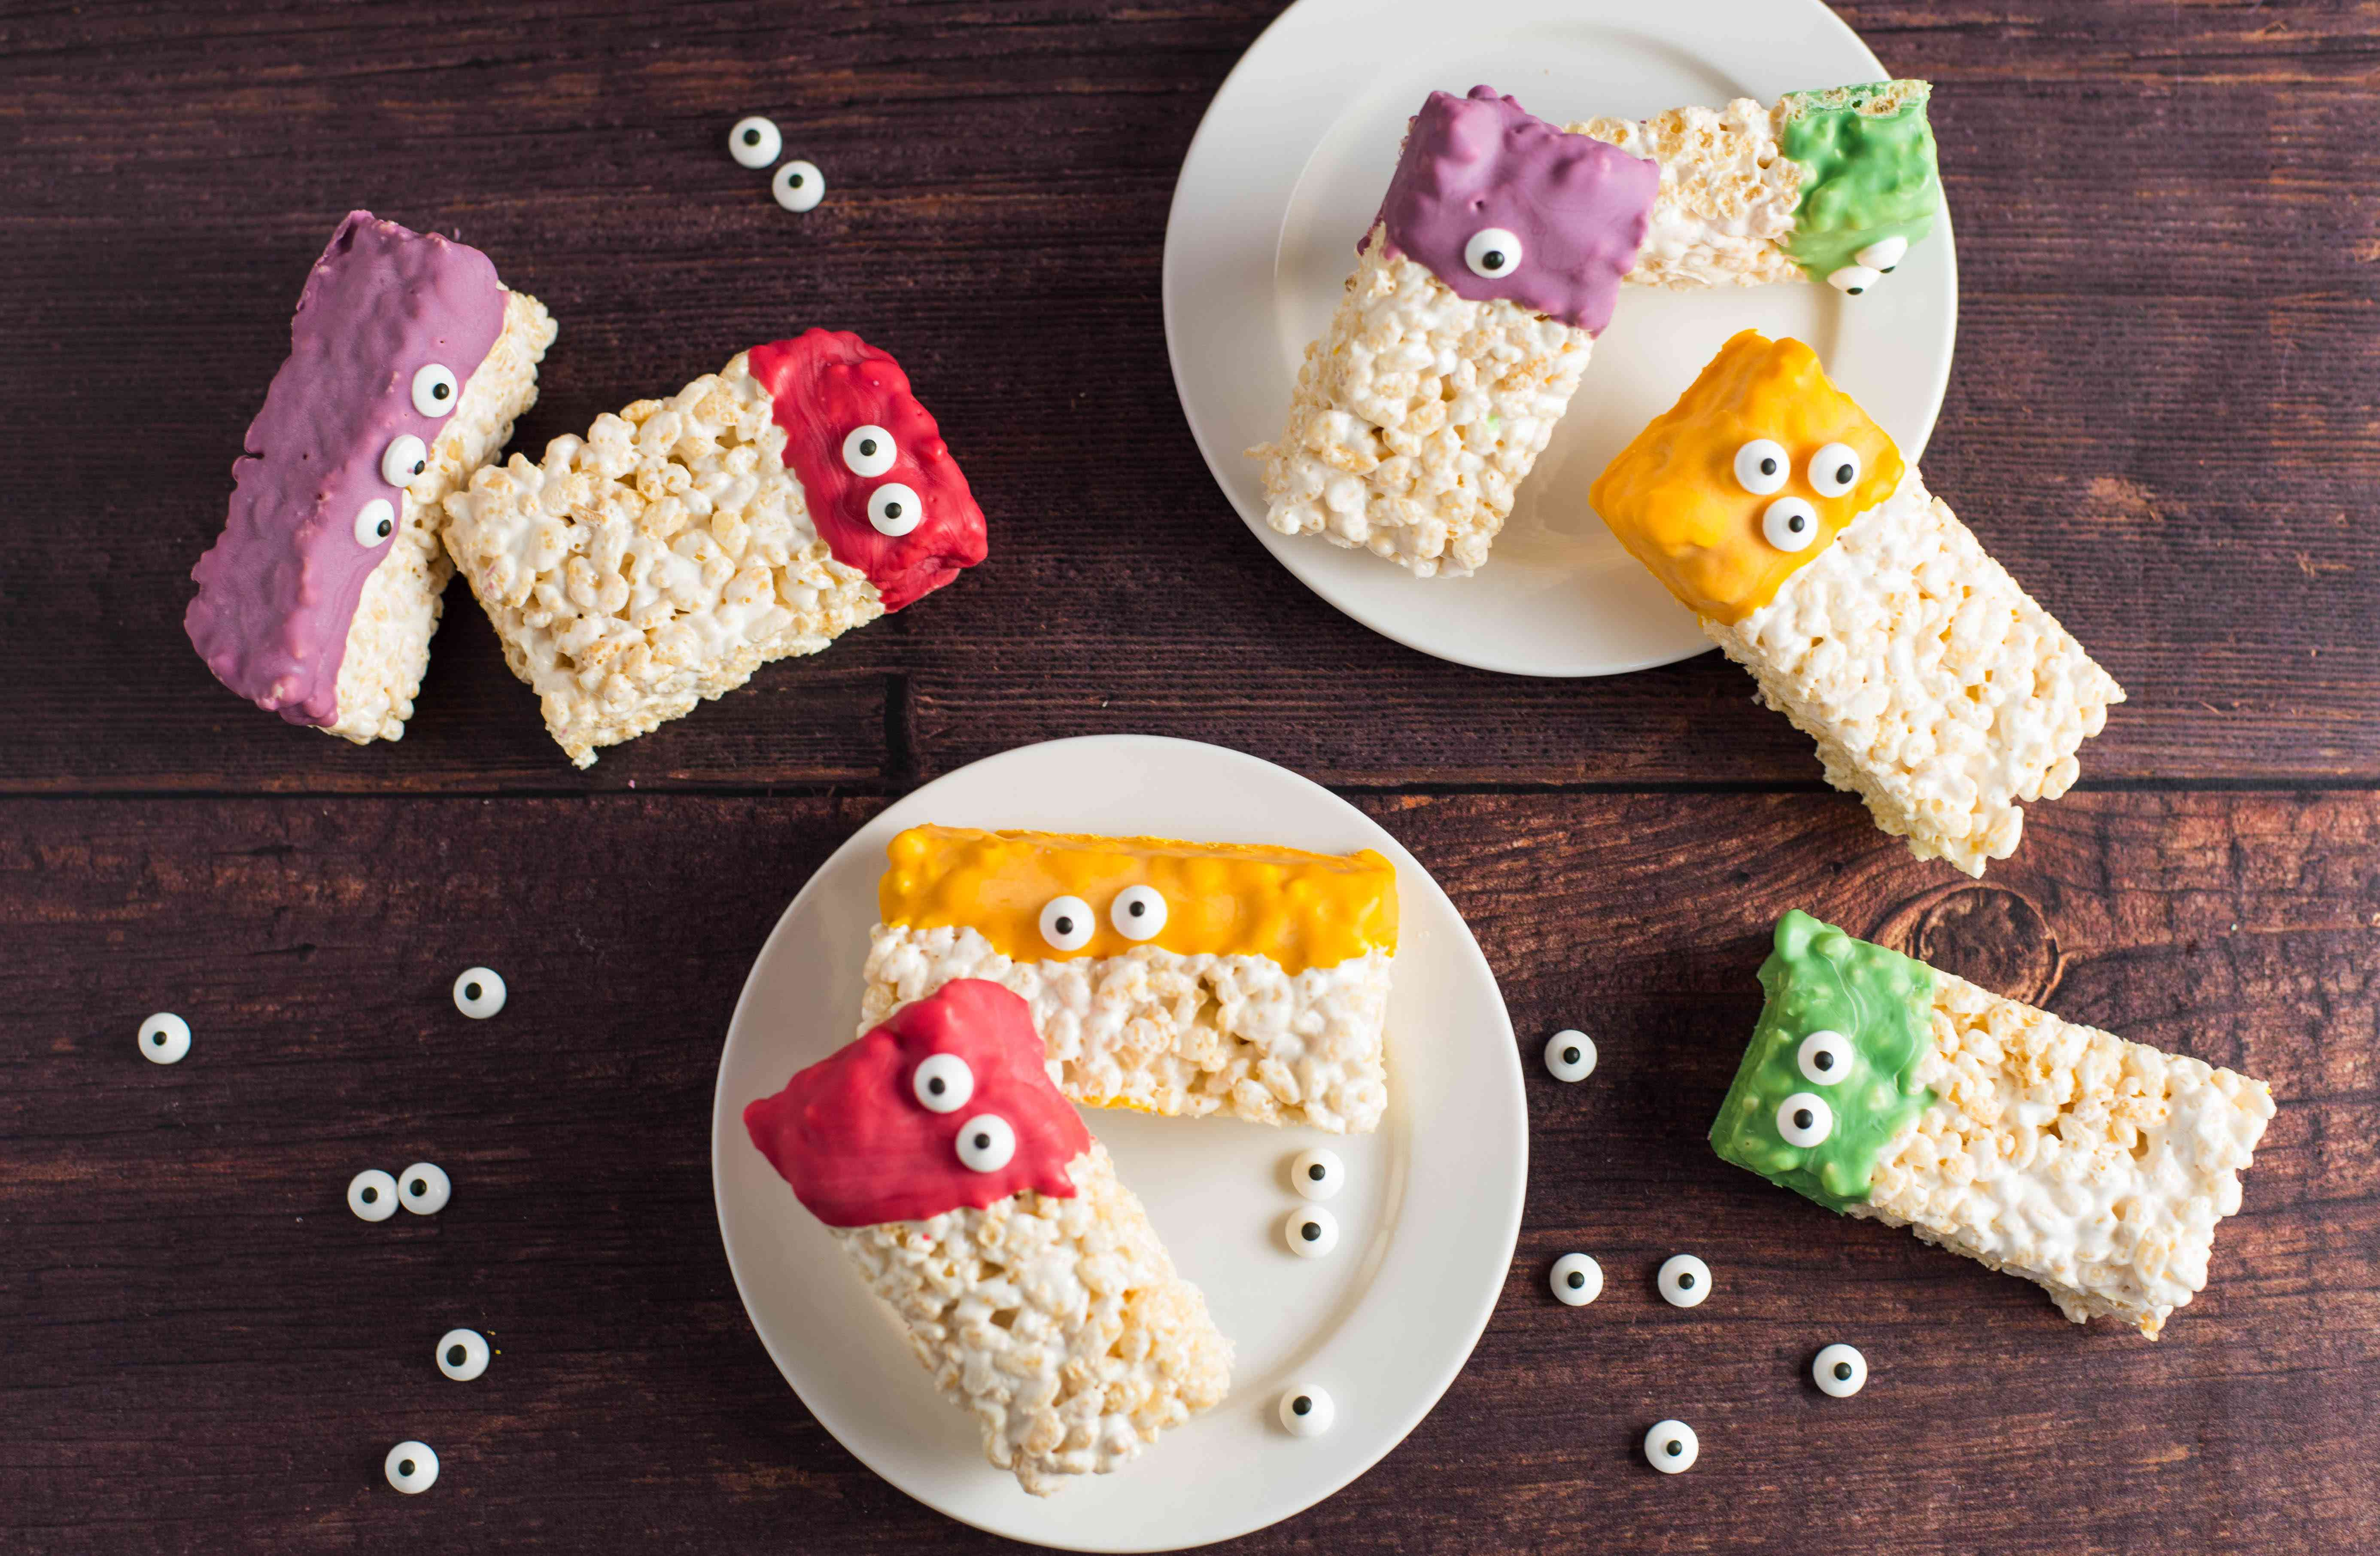 Monster rice krispie treat recipe